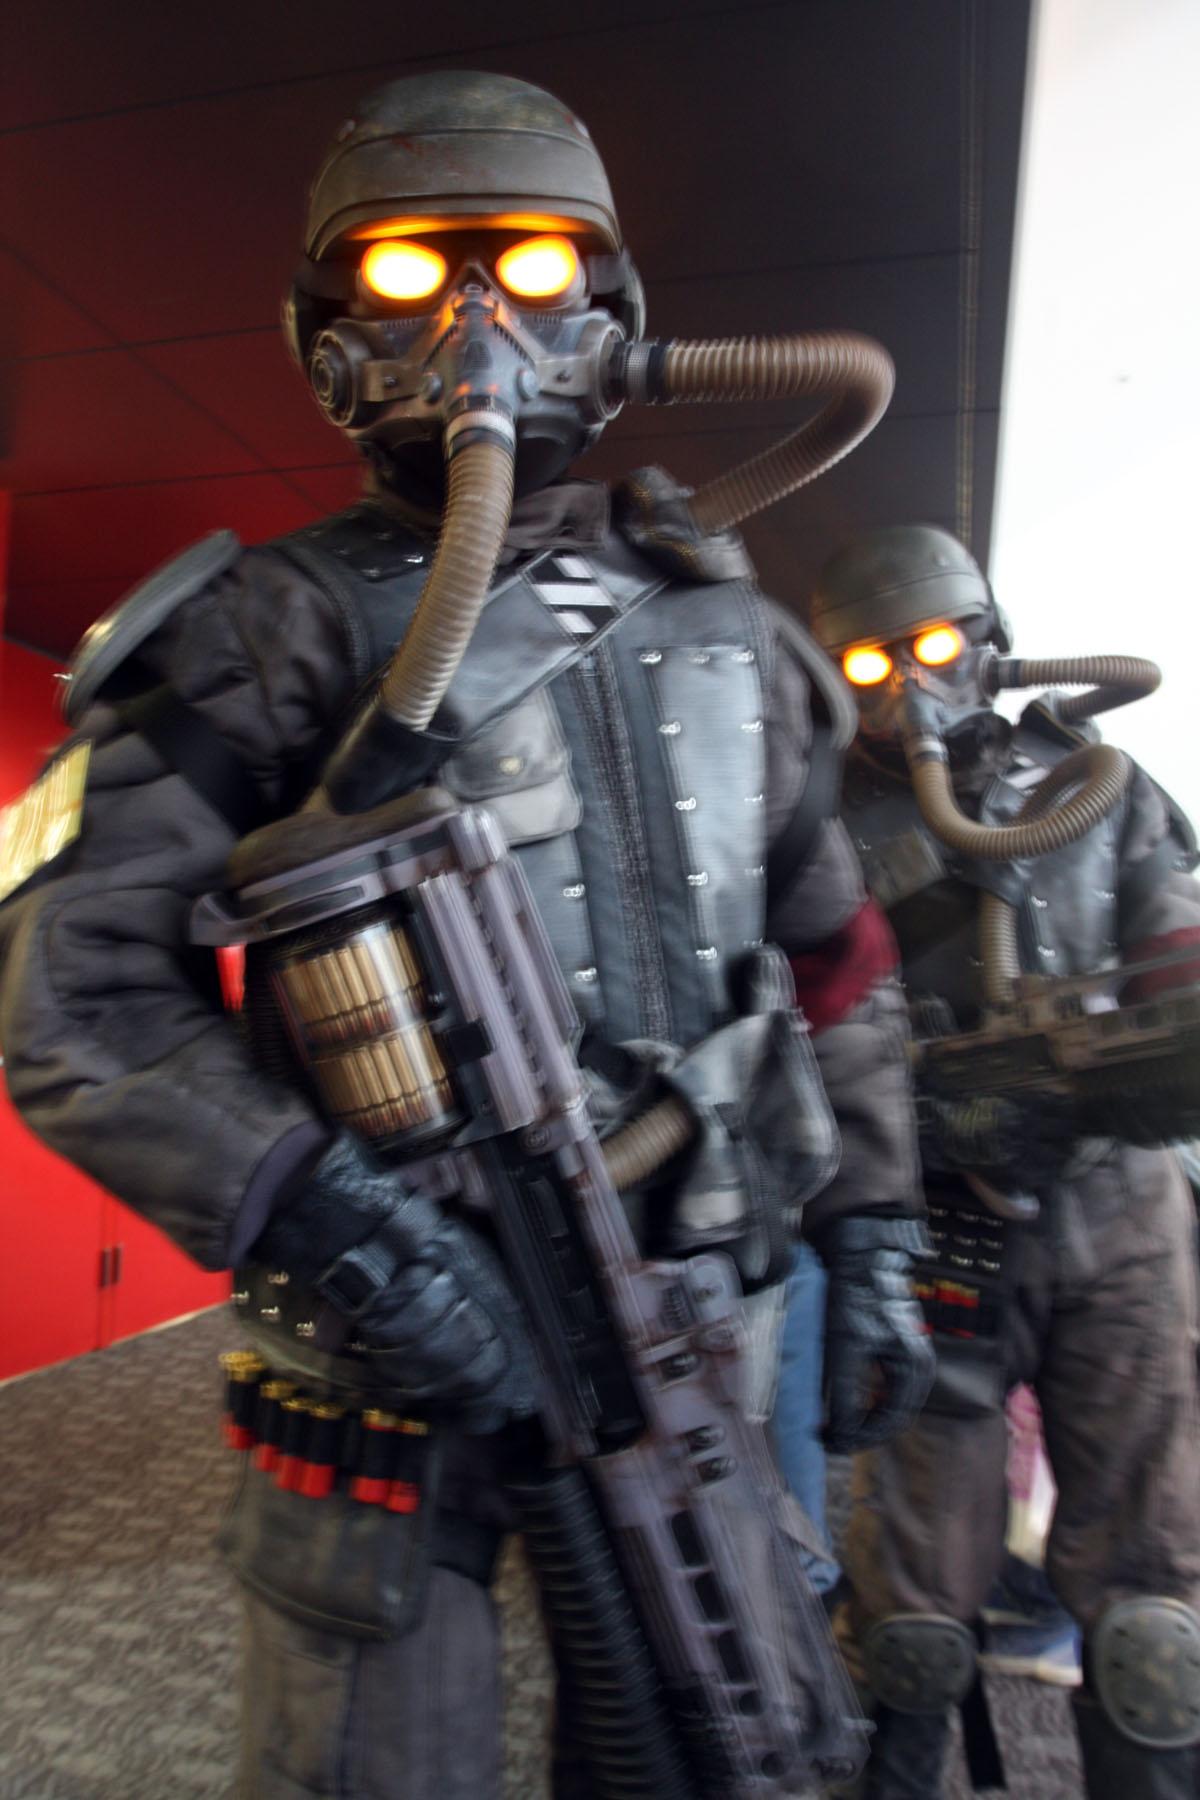 Gallery of 10 Most Badass Gaming Cosplay Costumes - EchoMon